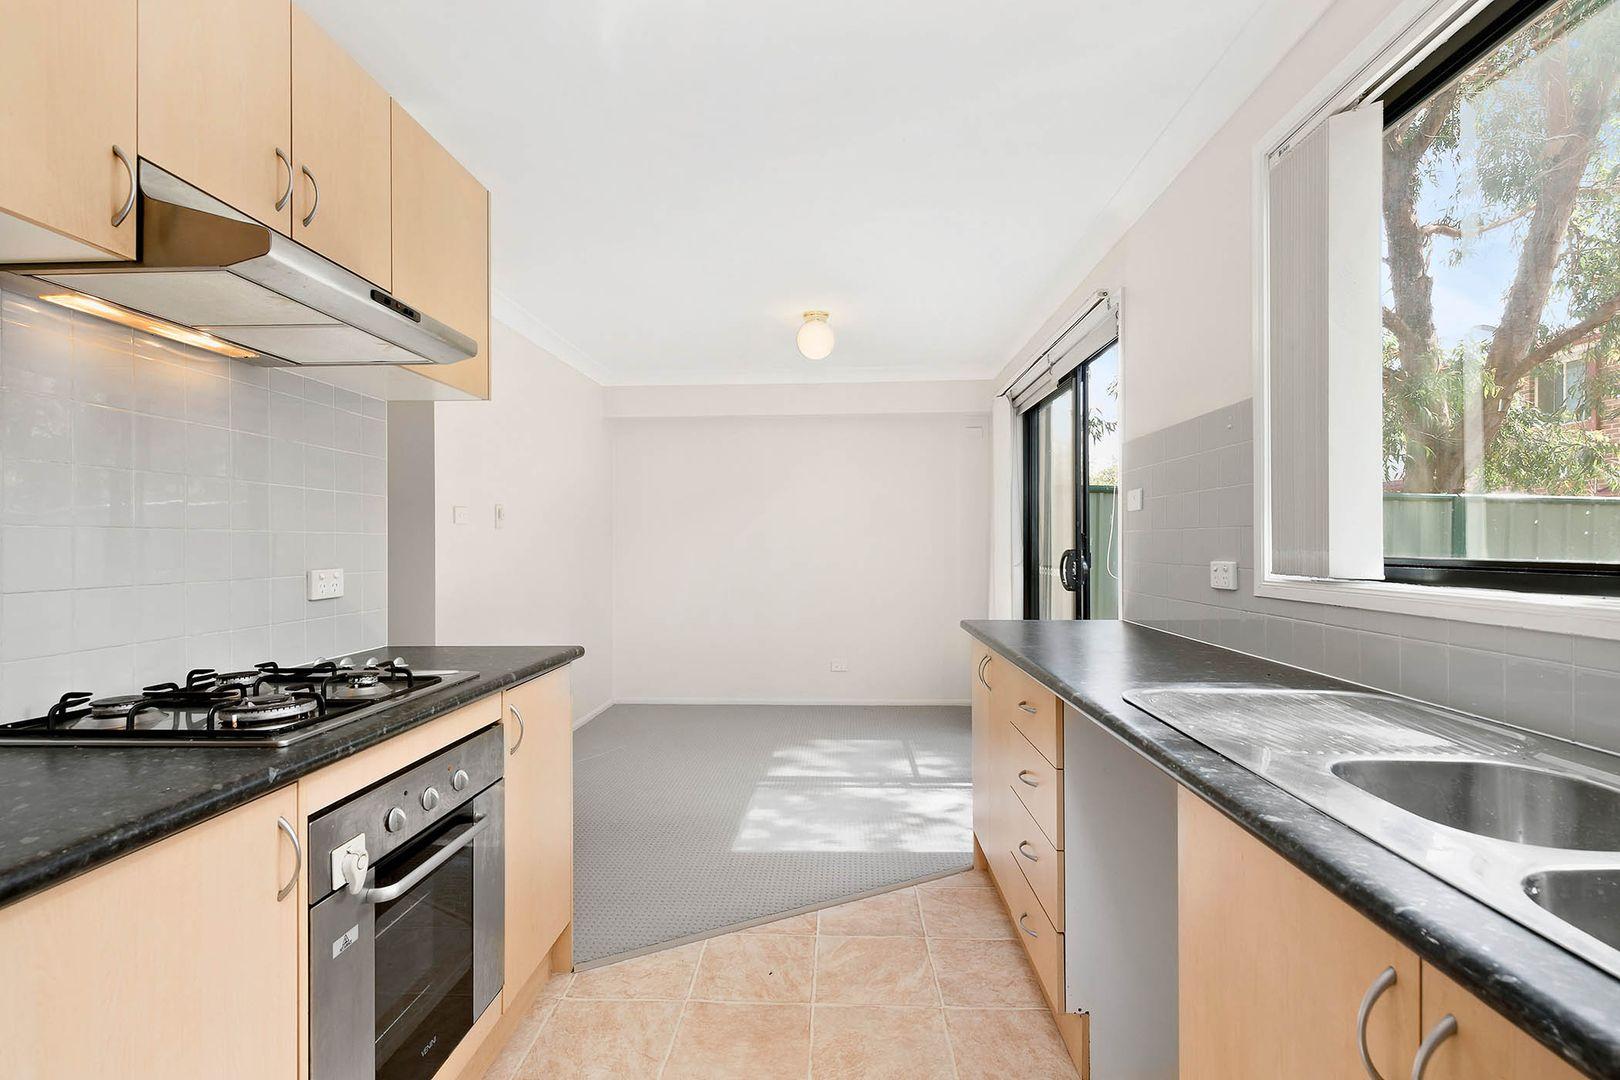 18/15-25 Atchison Street, St Marys NSW 2760, Image 1